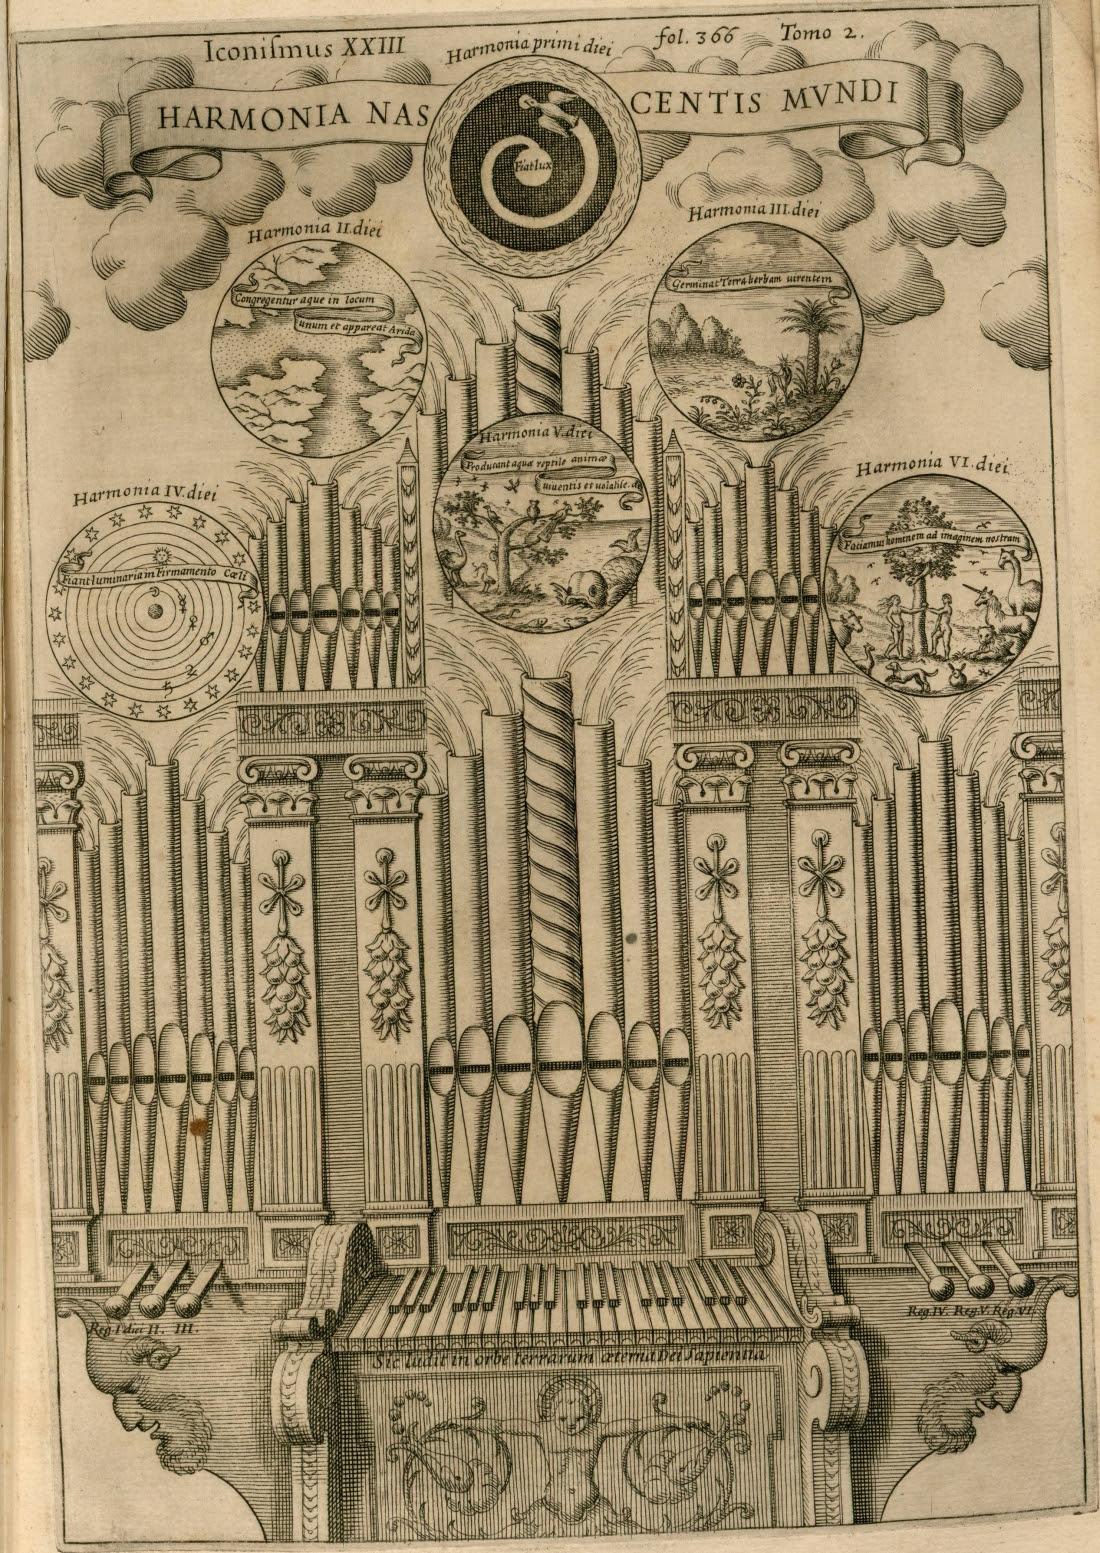 Genesis creation via organ harmonics